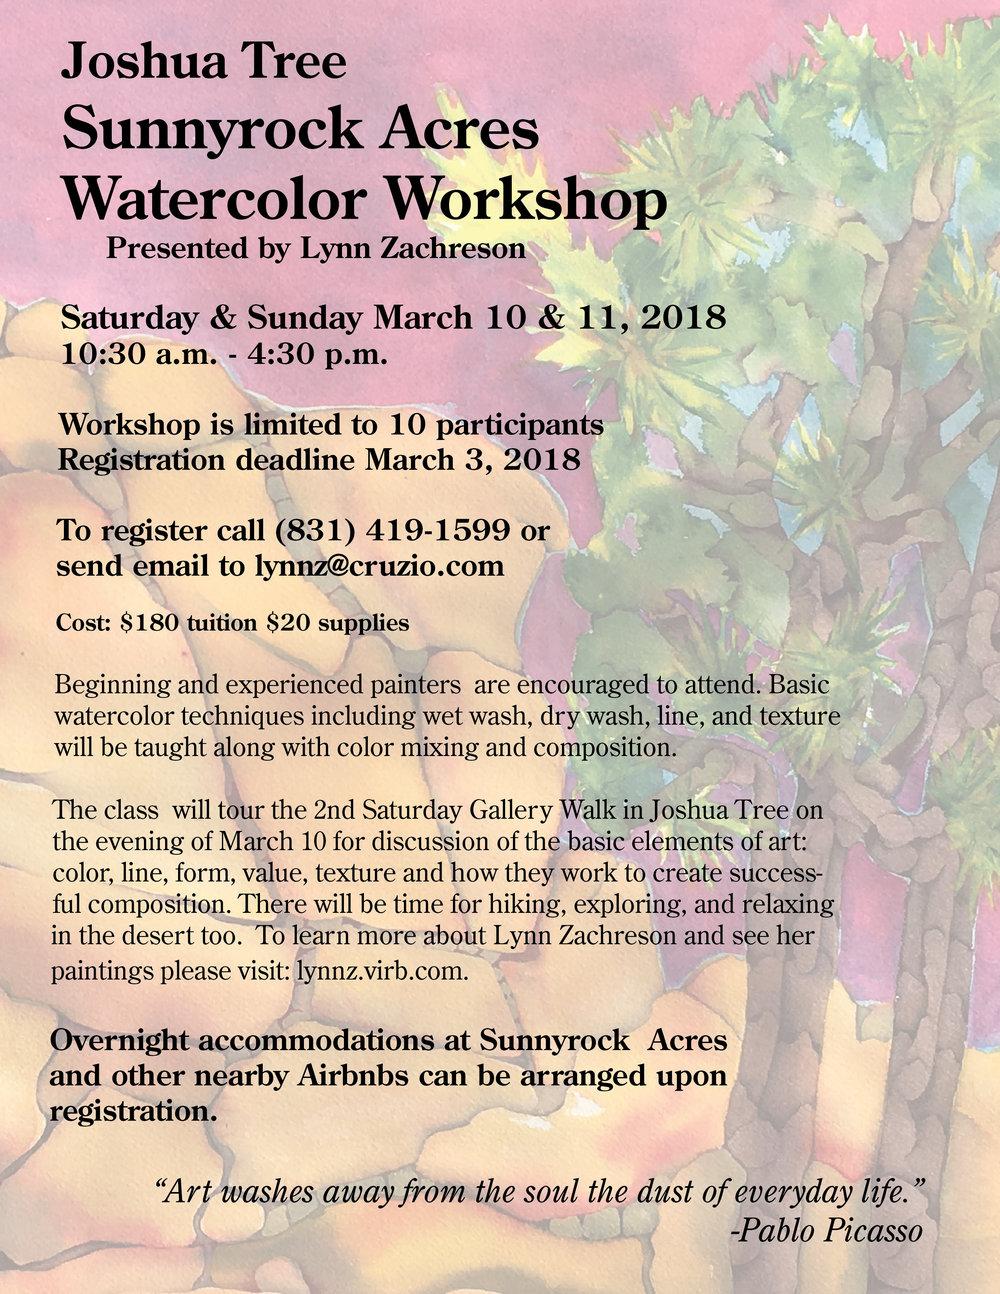 Sunnyrock Acres Watercolor Workshop with Lynn Zachreson